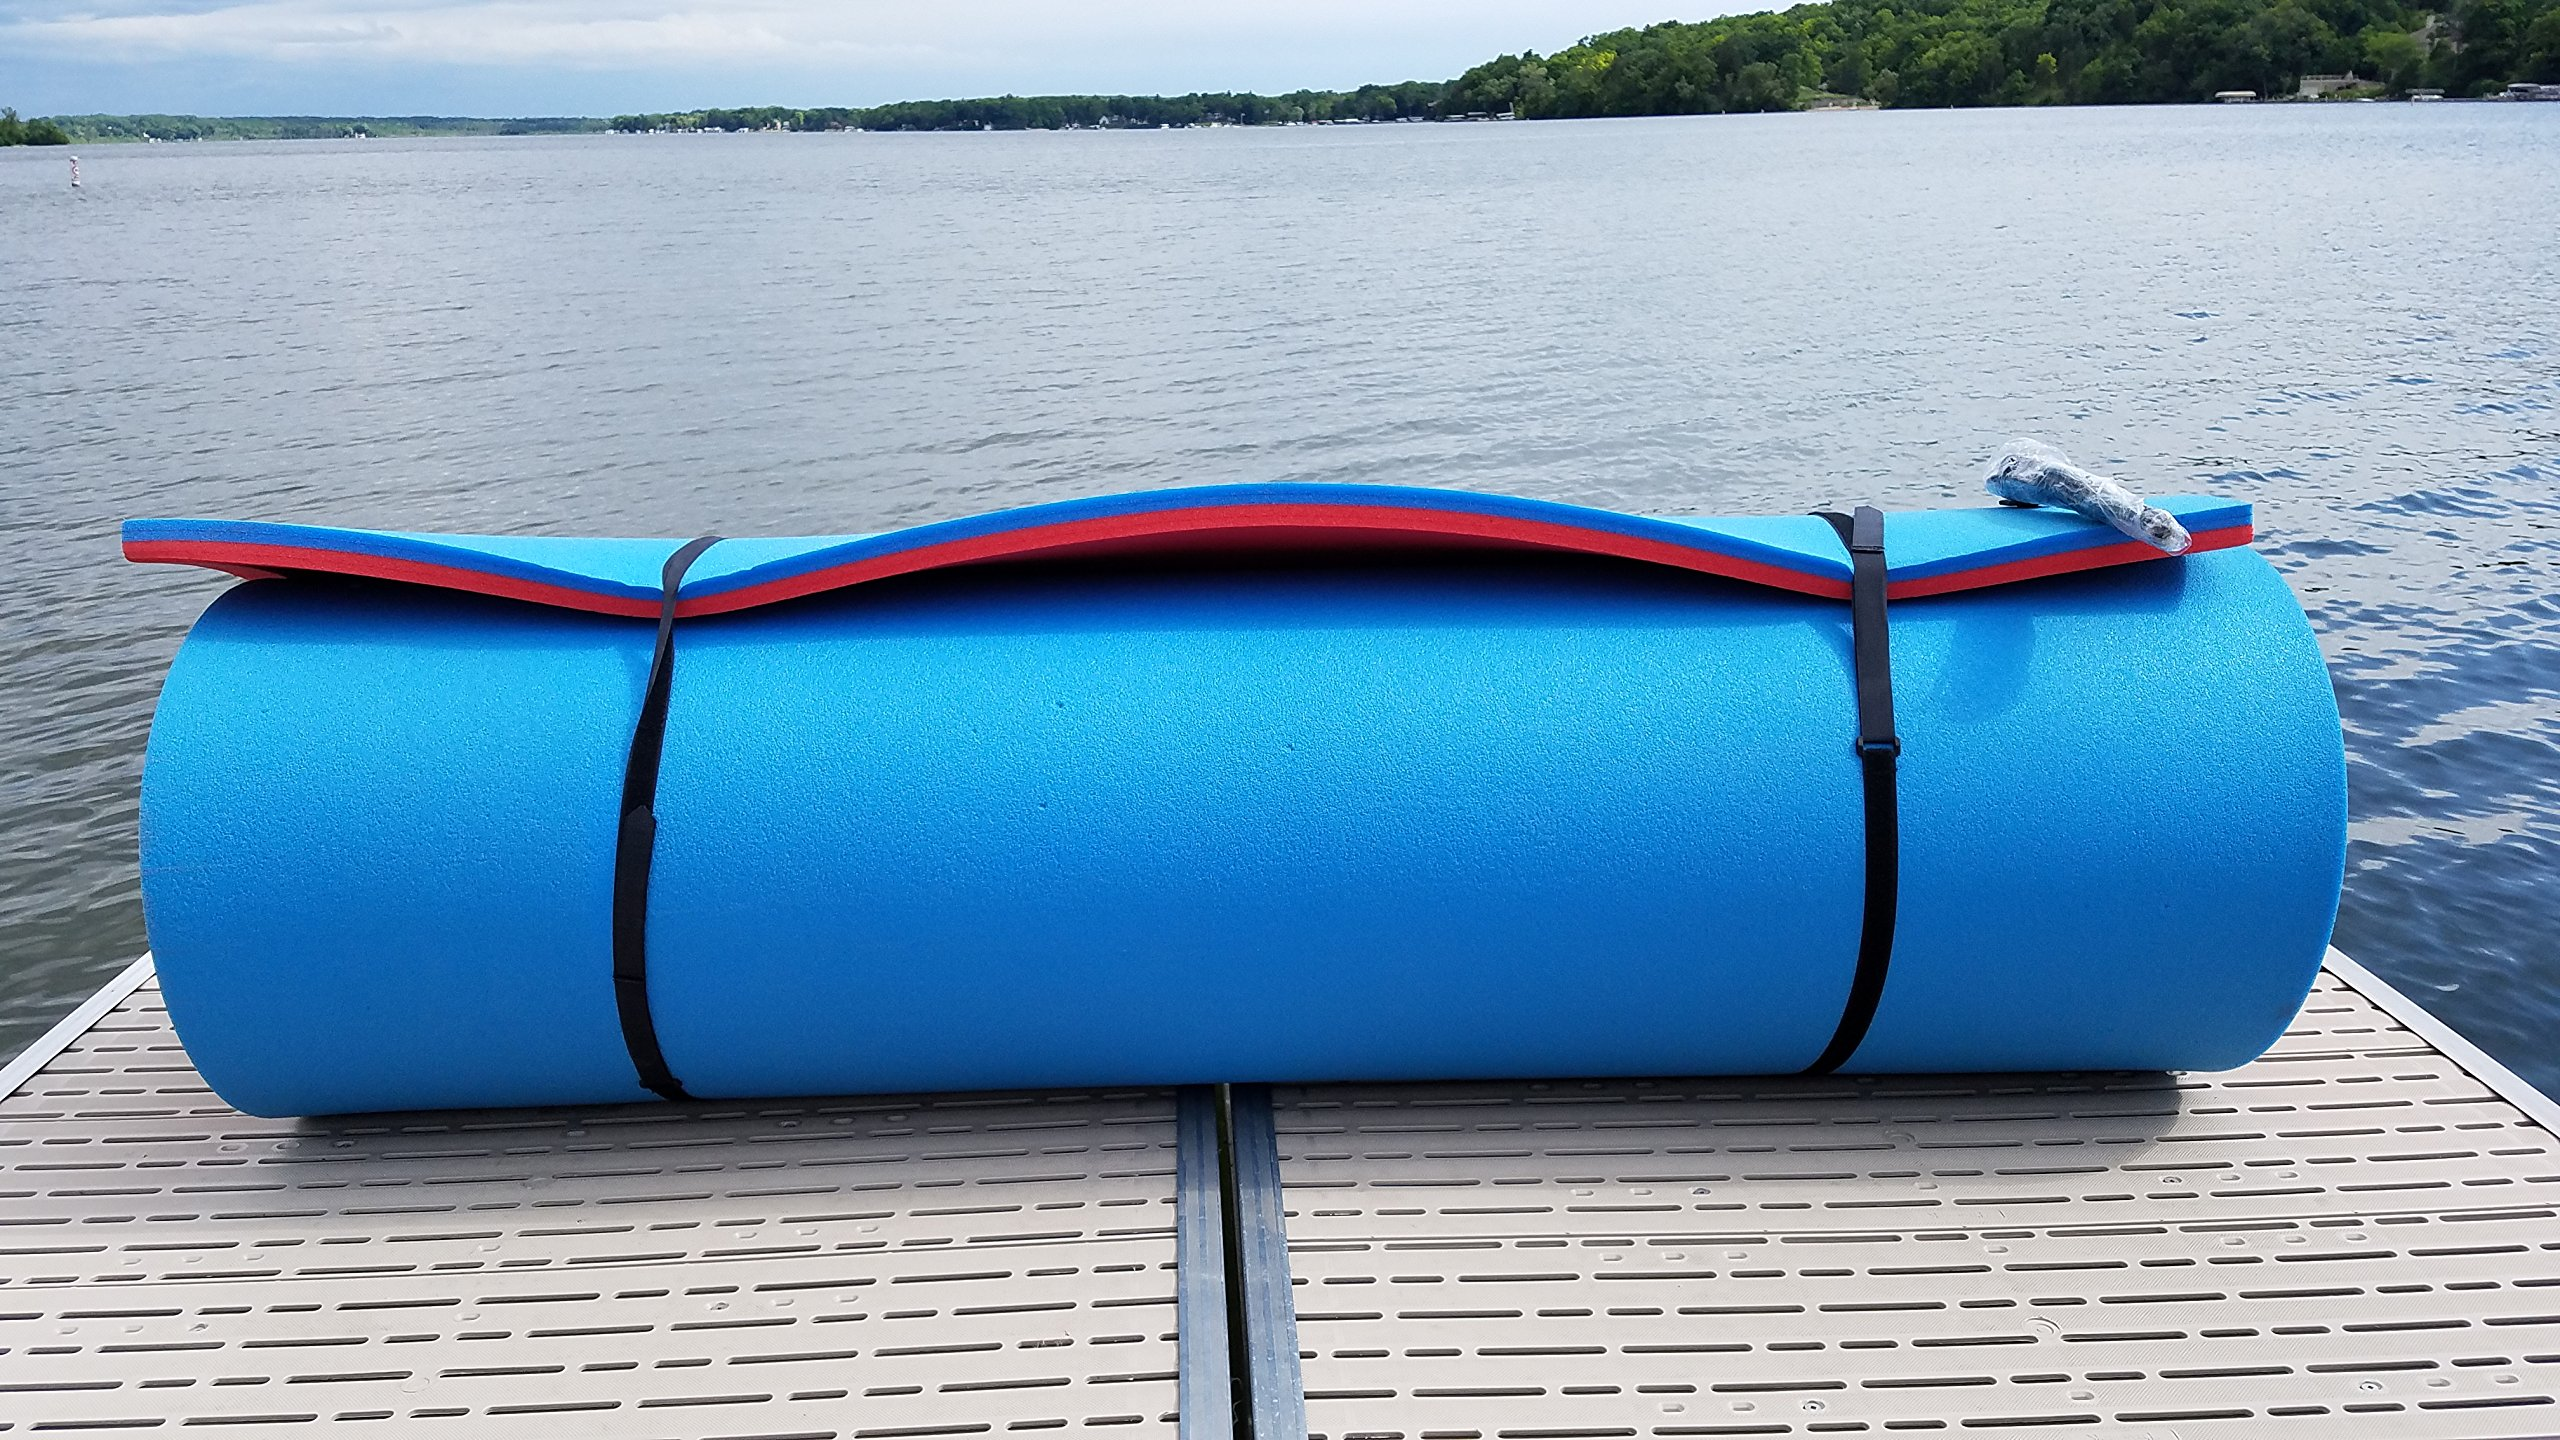 Vico Marine Floating Foam Pad - Red/Blue by Vico Marine (Image #1)